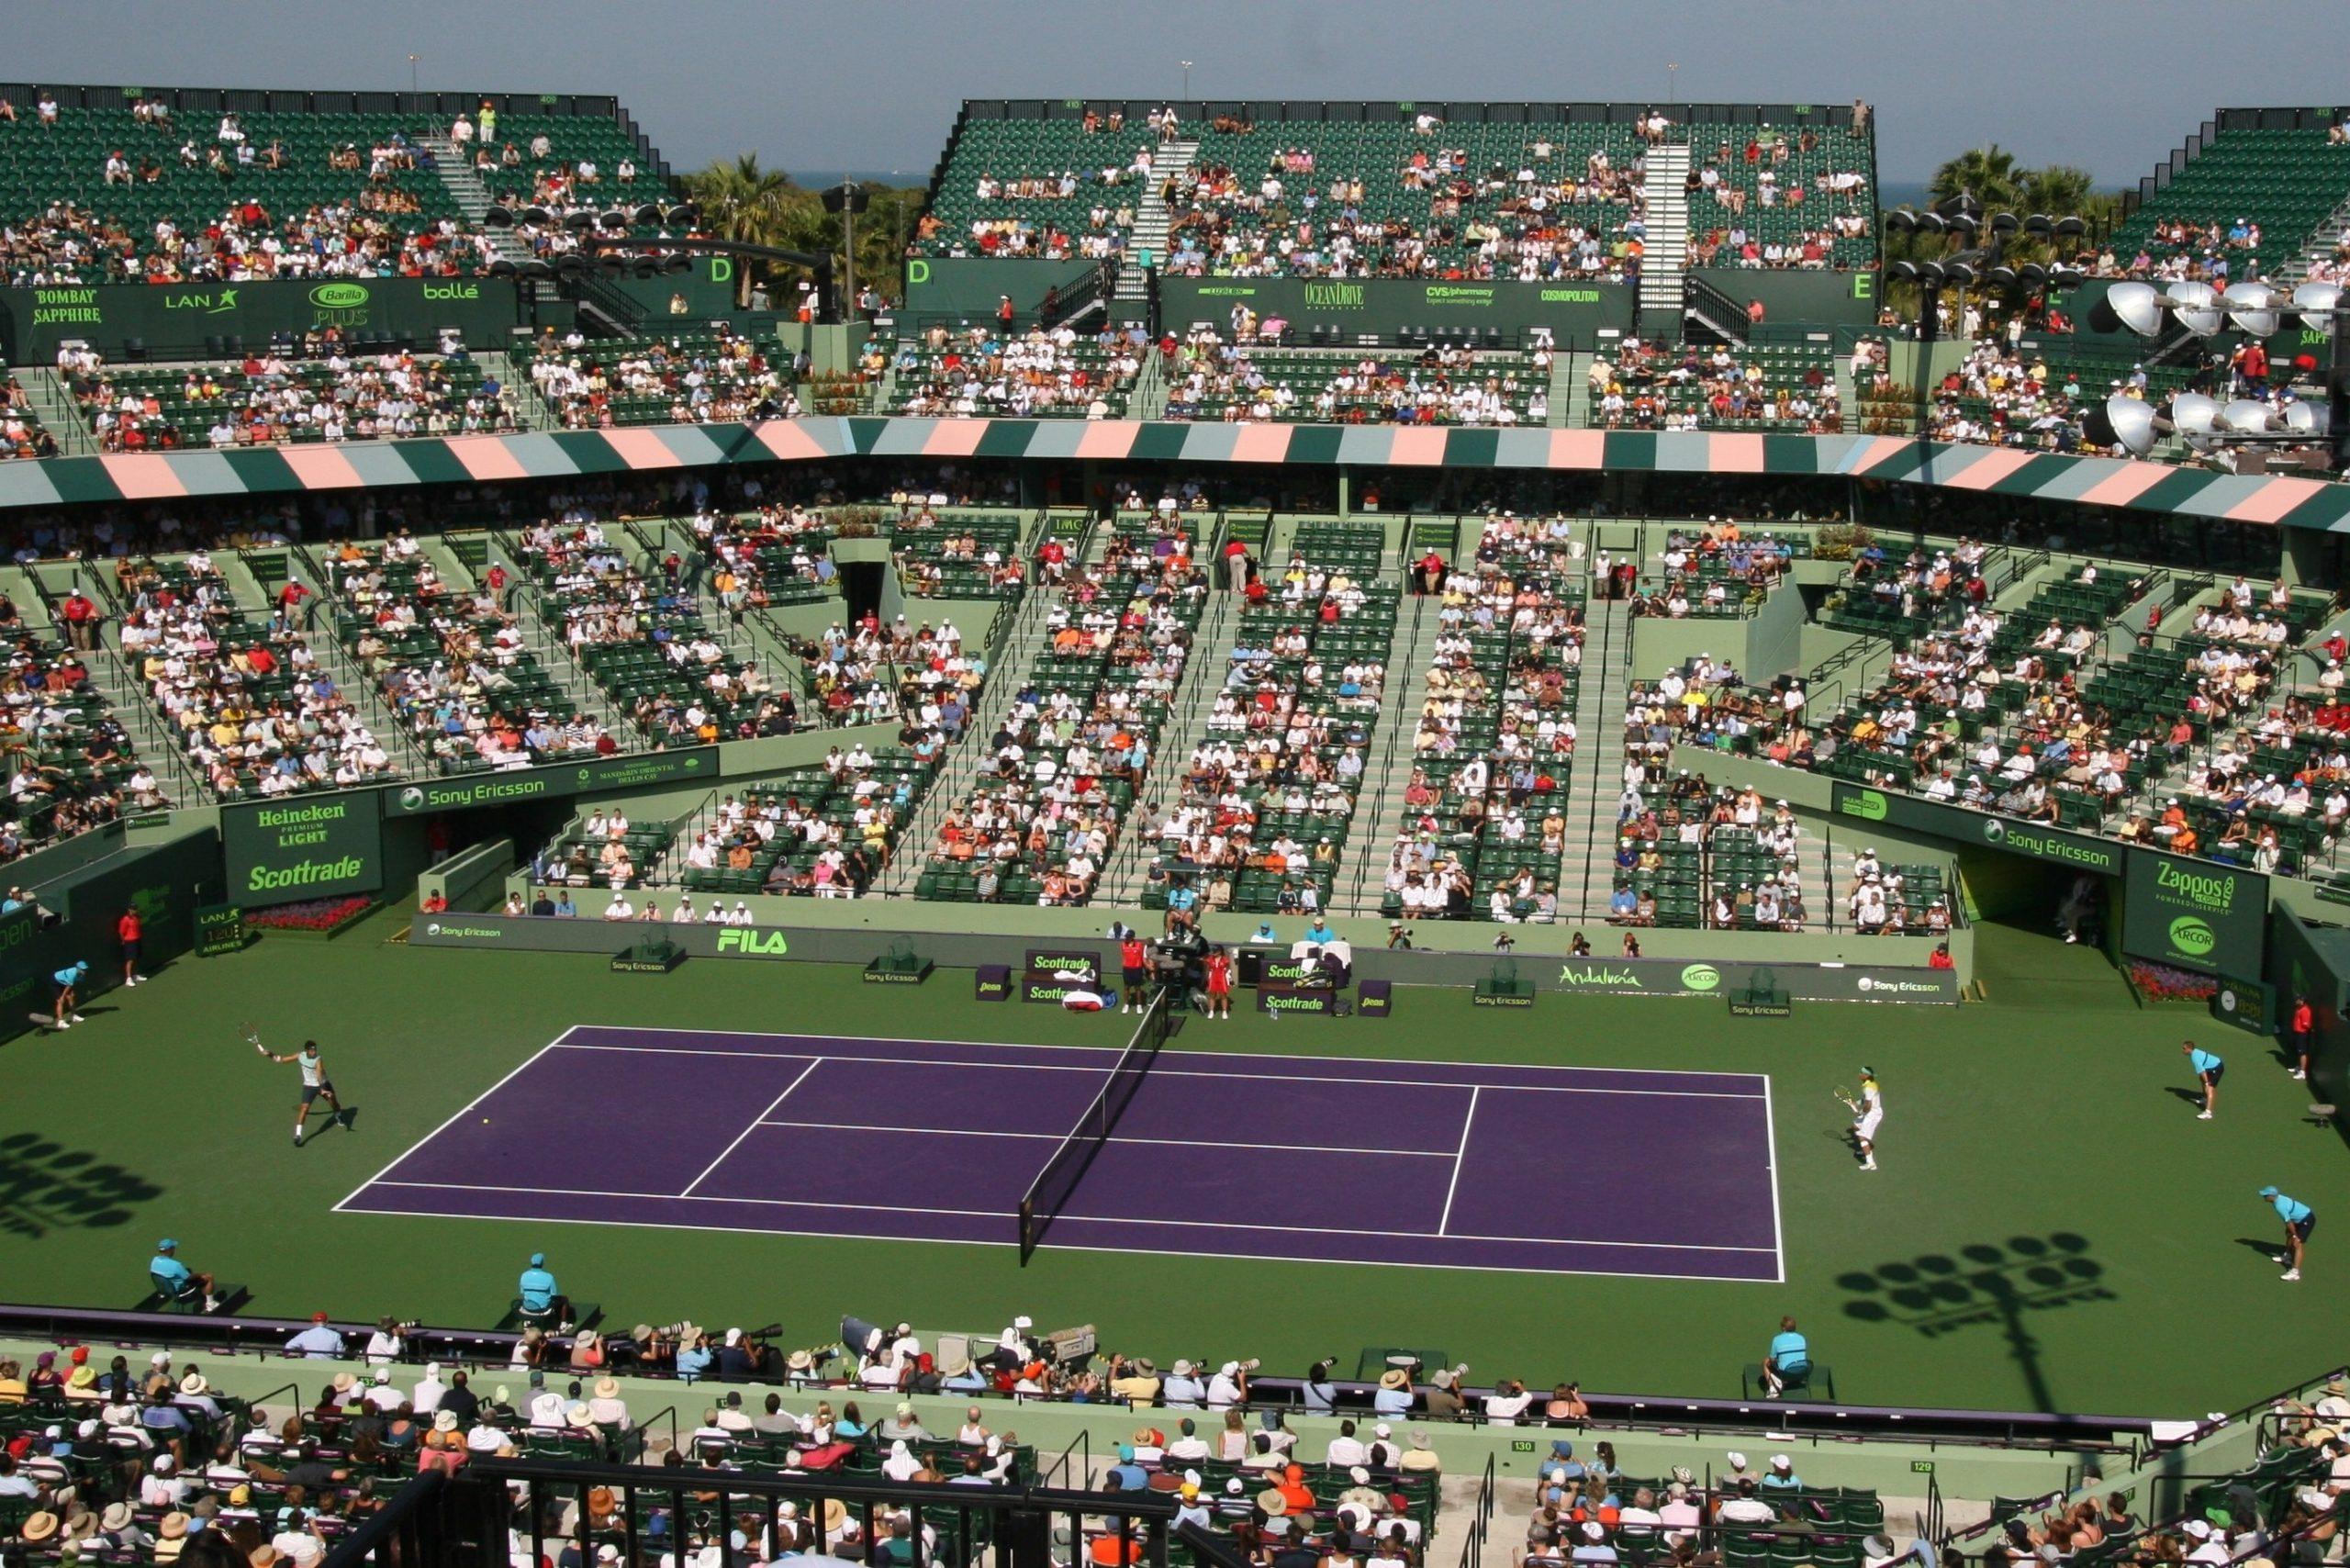 Tennis Center At Crandon Park - Wikipedia with Miami Open Stadium Layout